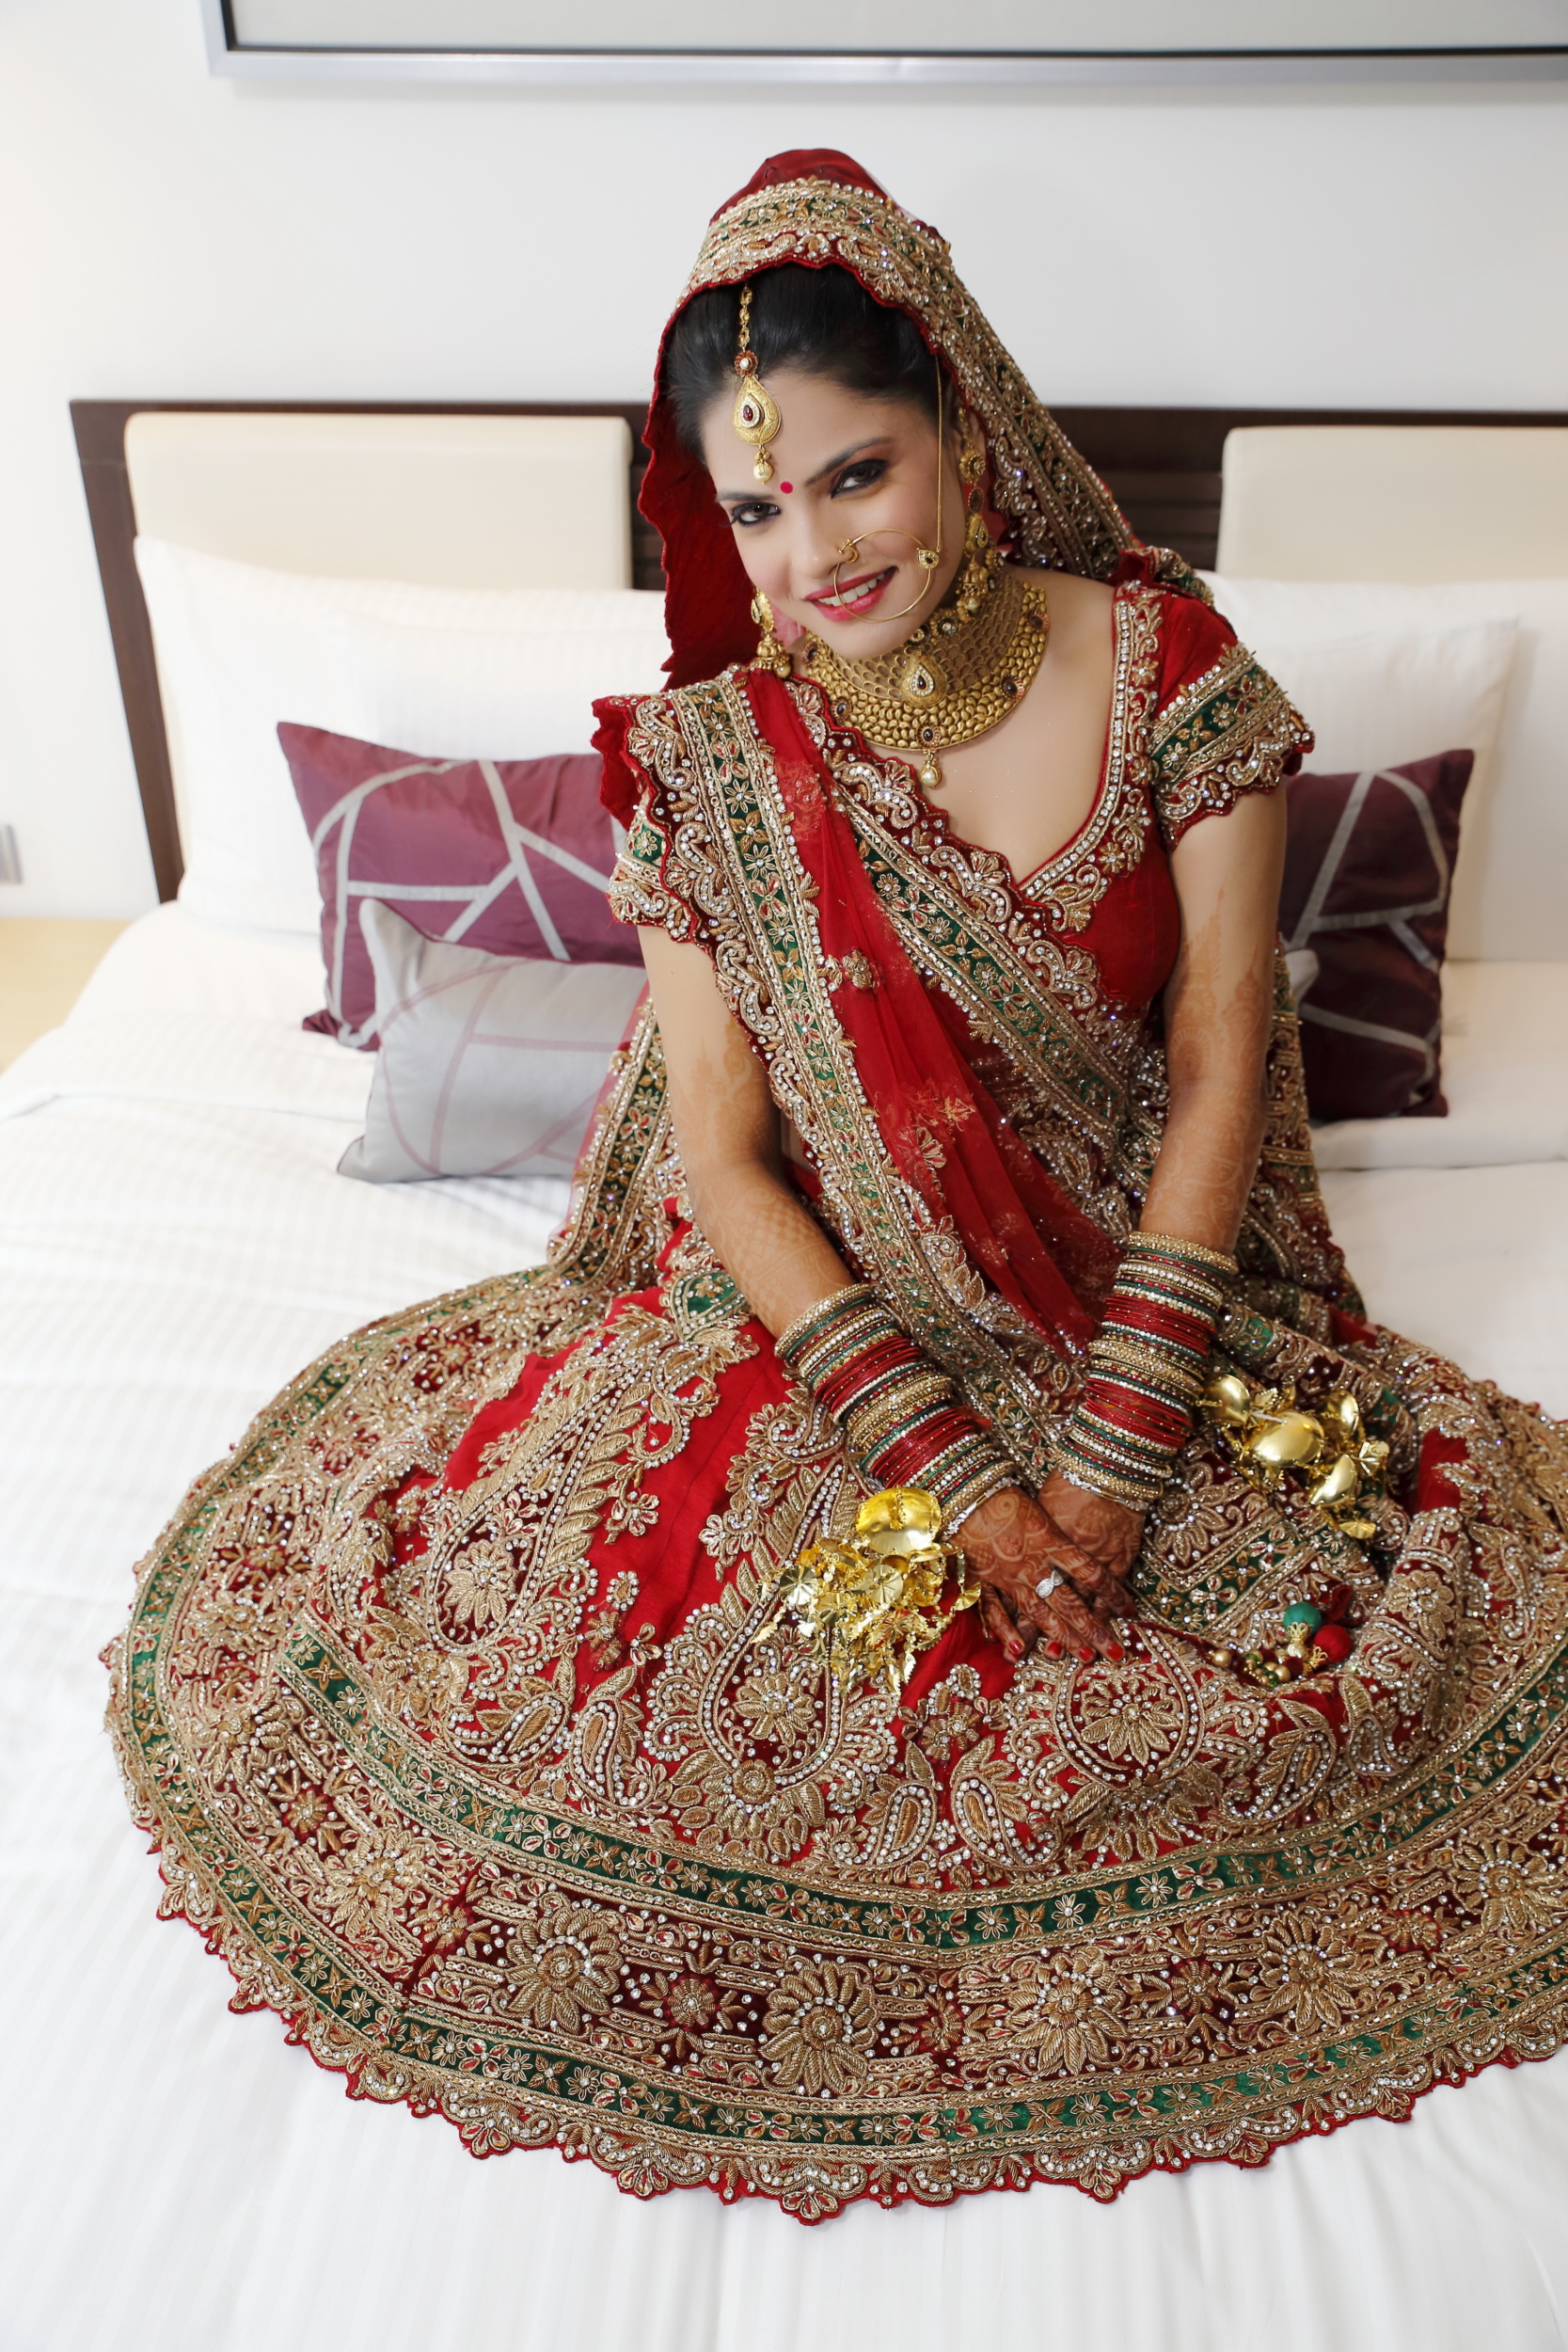 Best candid wedding -31 TWR Photographer Delhi NCR